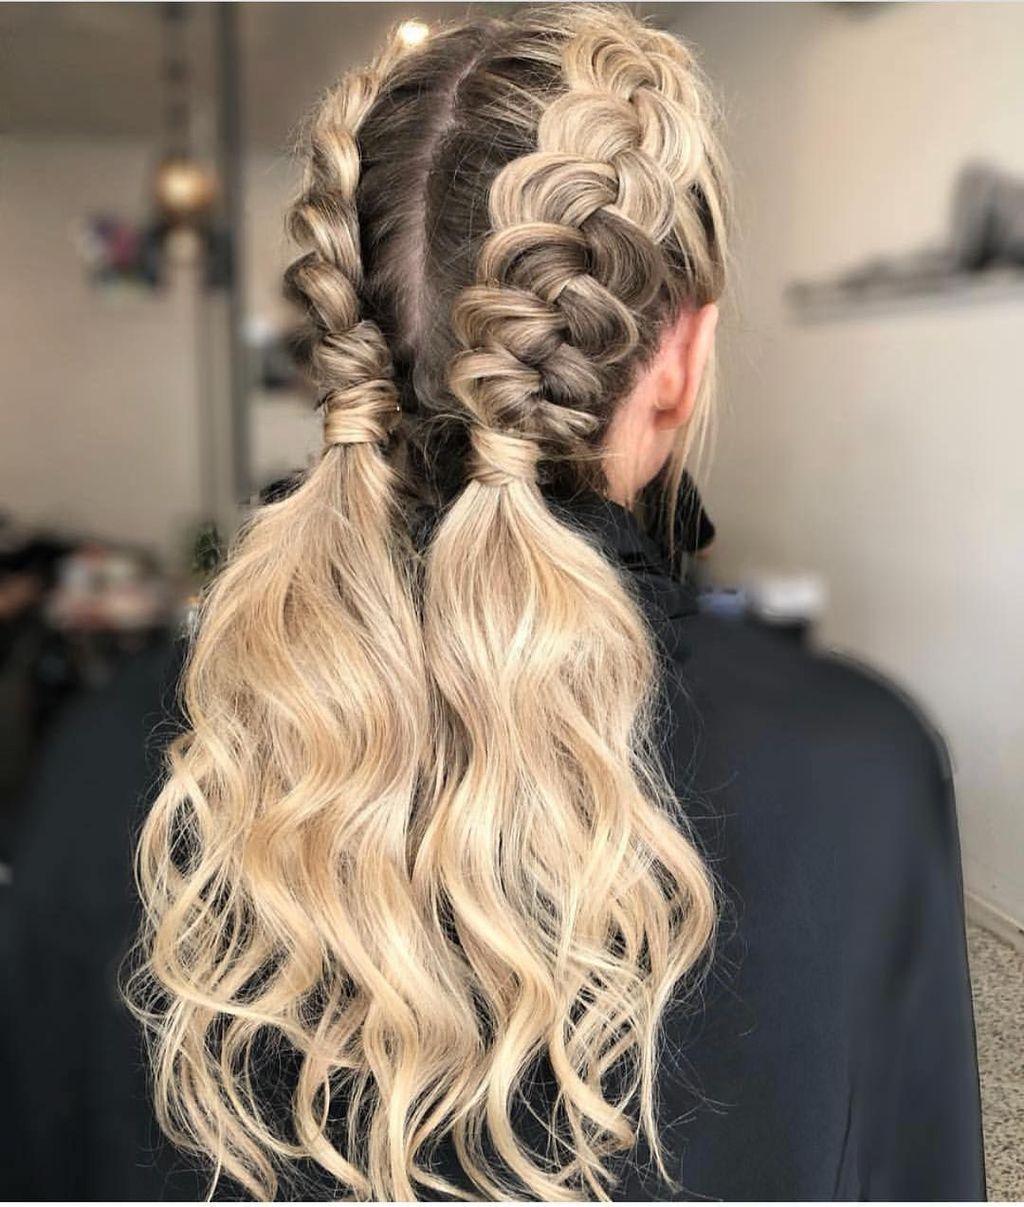 40 Charming Hairstyles Ideas For Long Hair Addicfashion Long Hair Highlights Hair Styles Prom Hairstyles For Long Hair